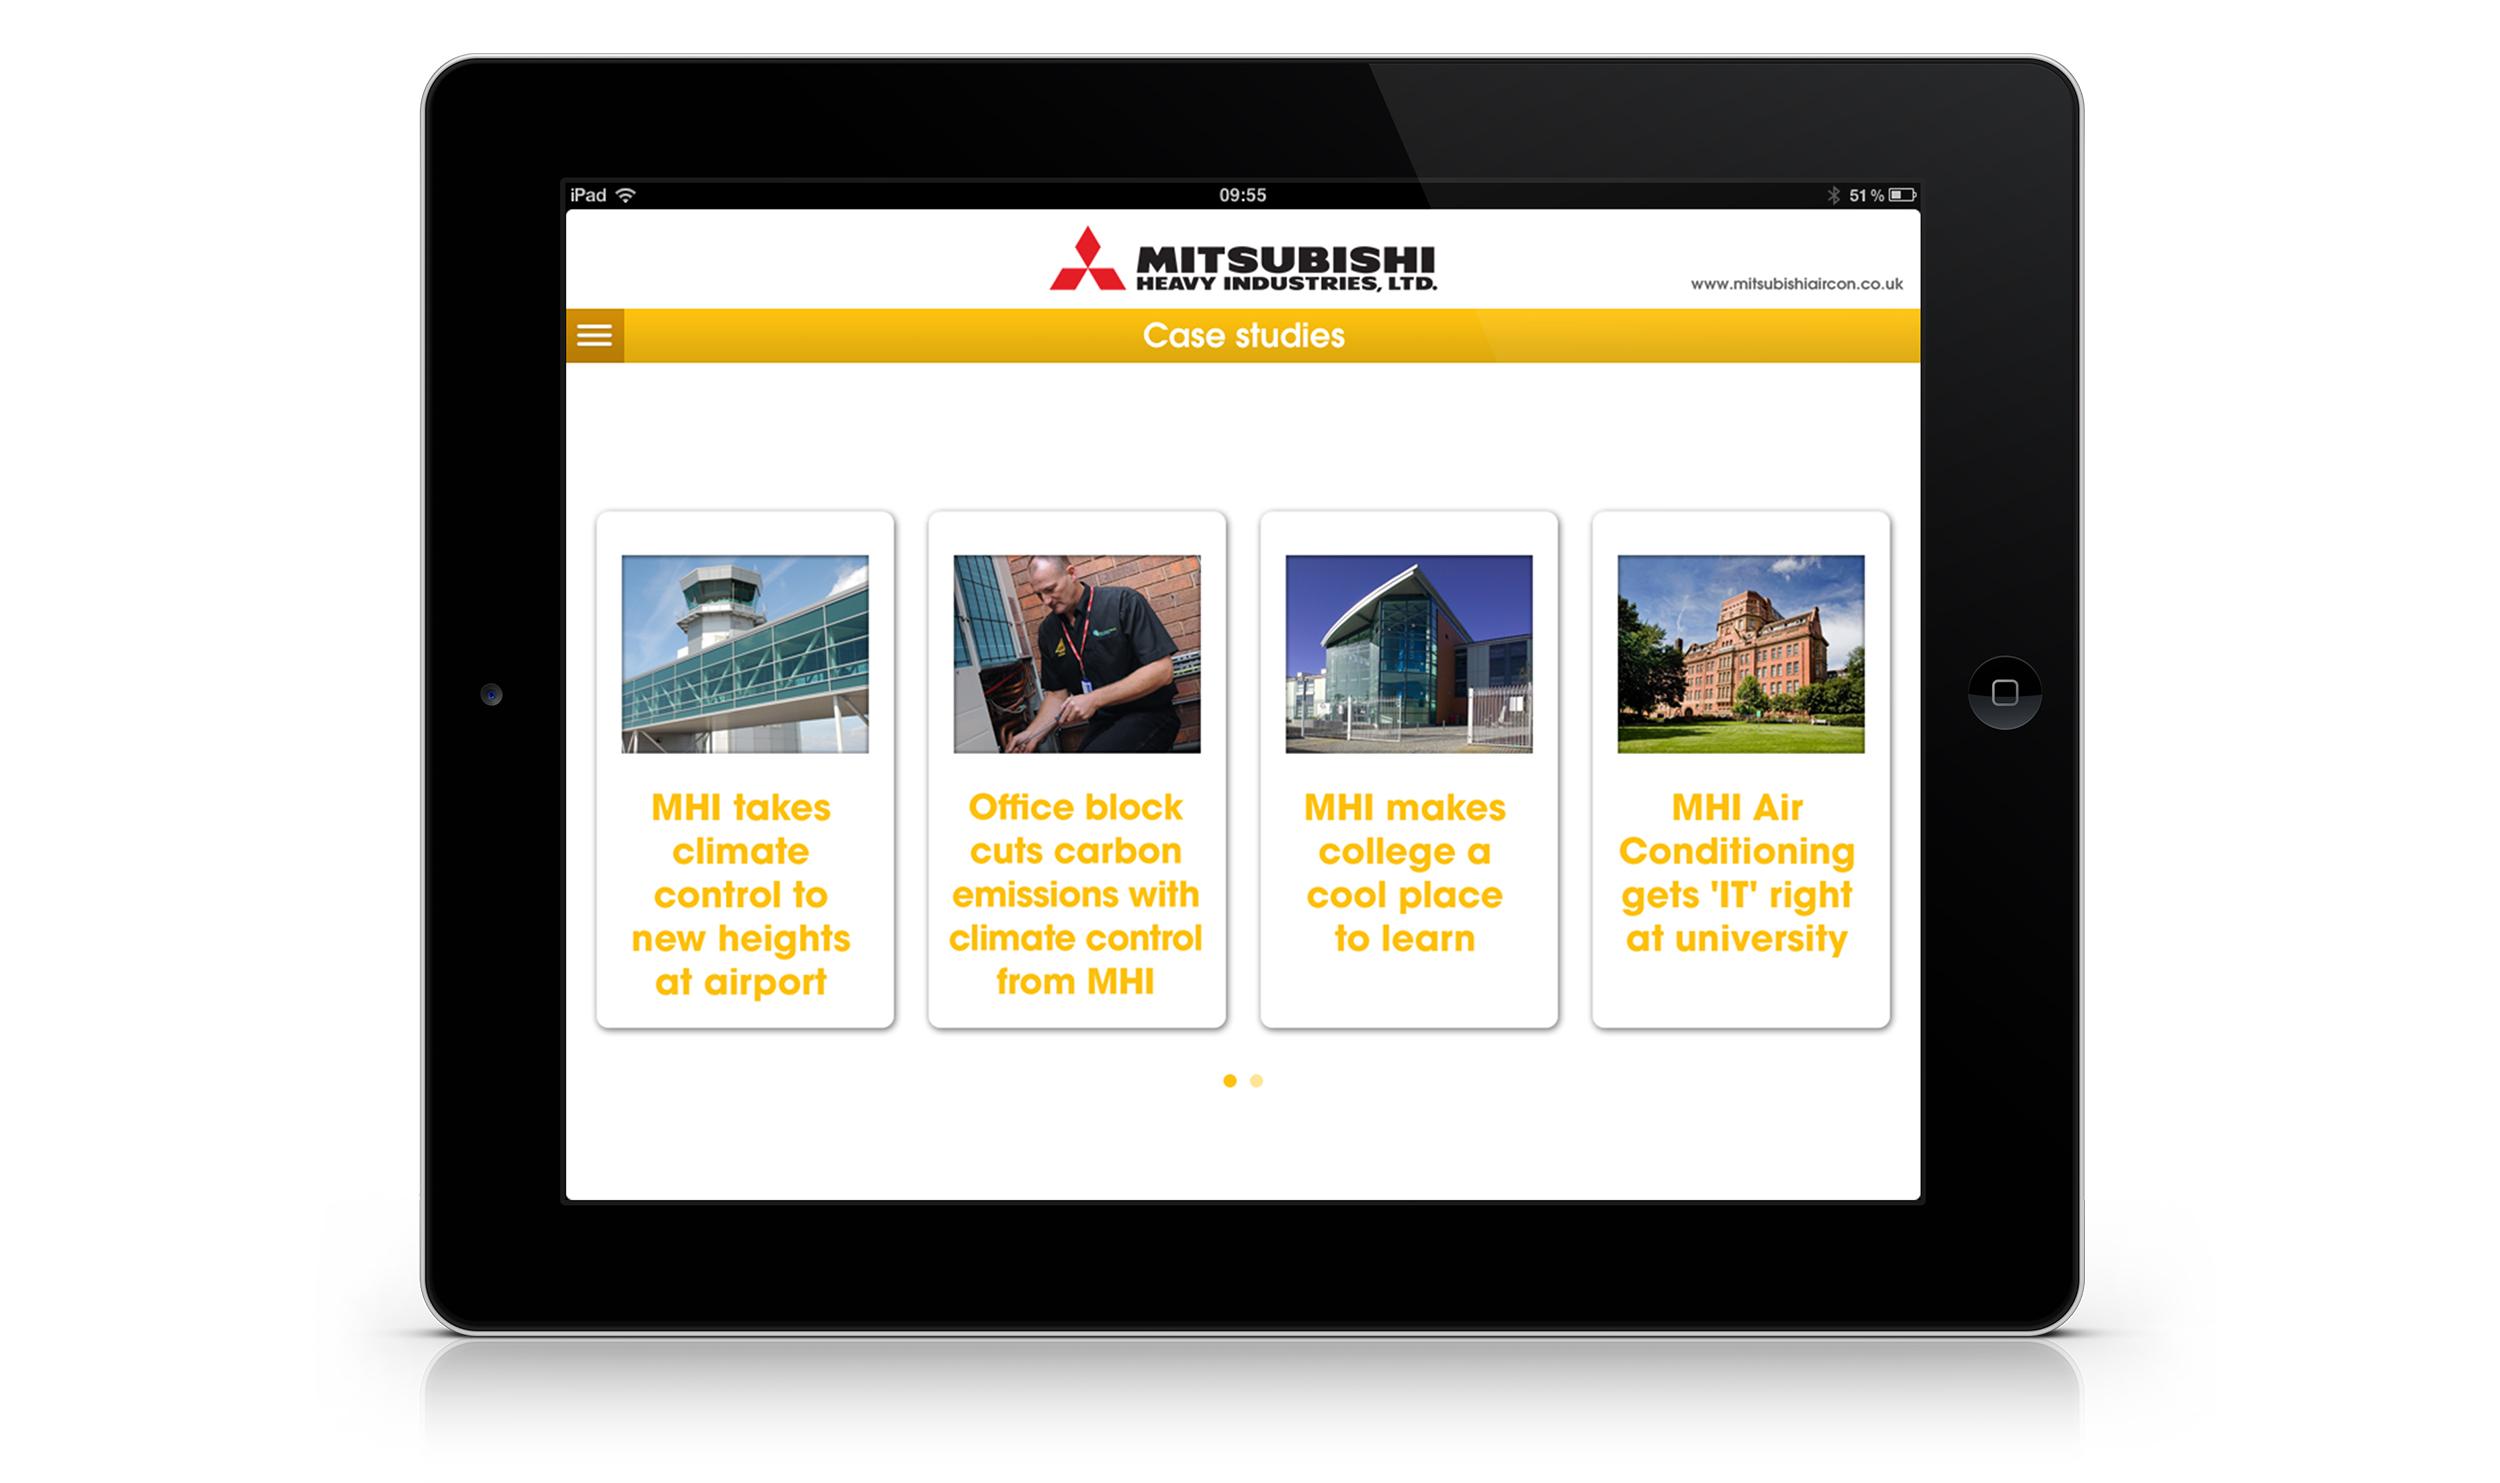 Case studies menu screen.